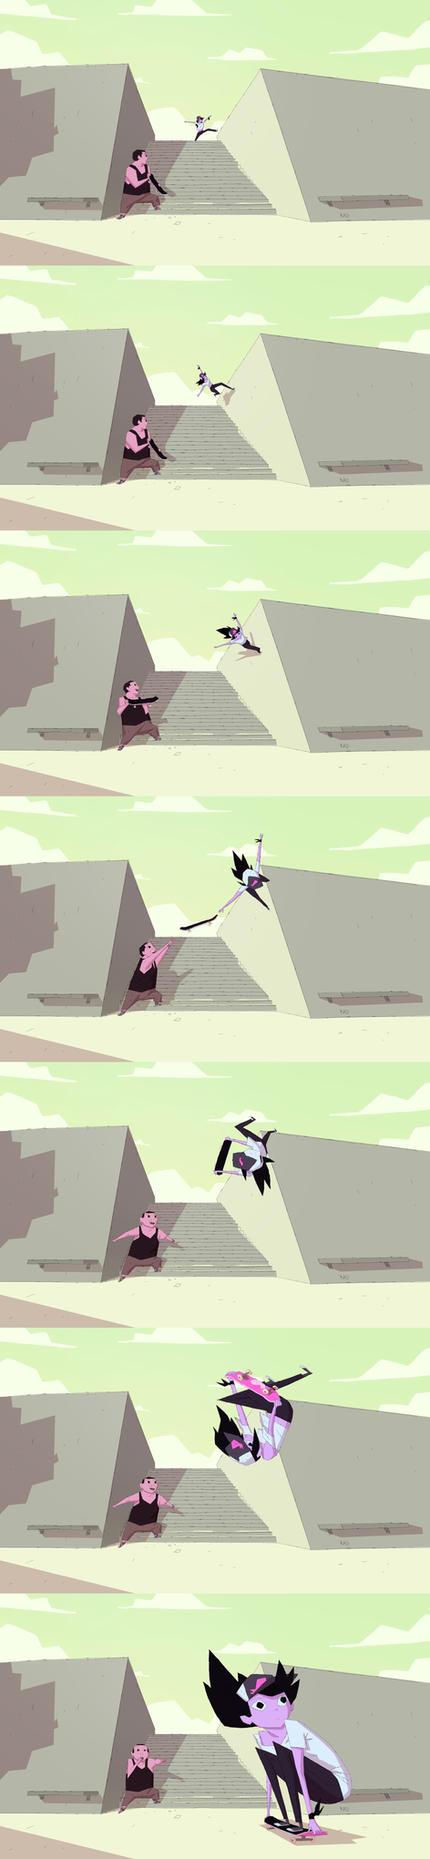 Kyoko Trick by radsechrist